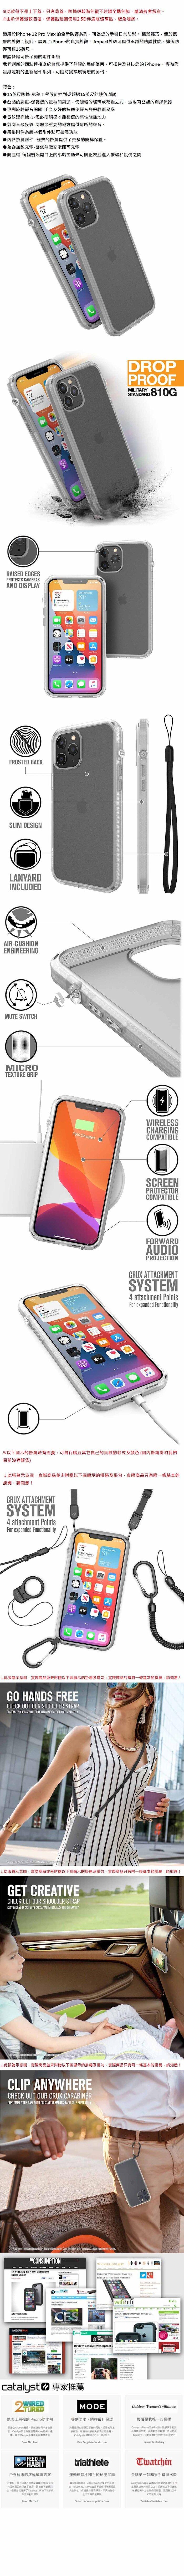 "CATALYST iPhone12 Pro Max (6.7"")防摔耐衝擊保護殼-磨砂透"